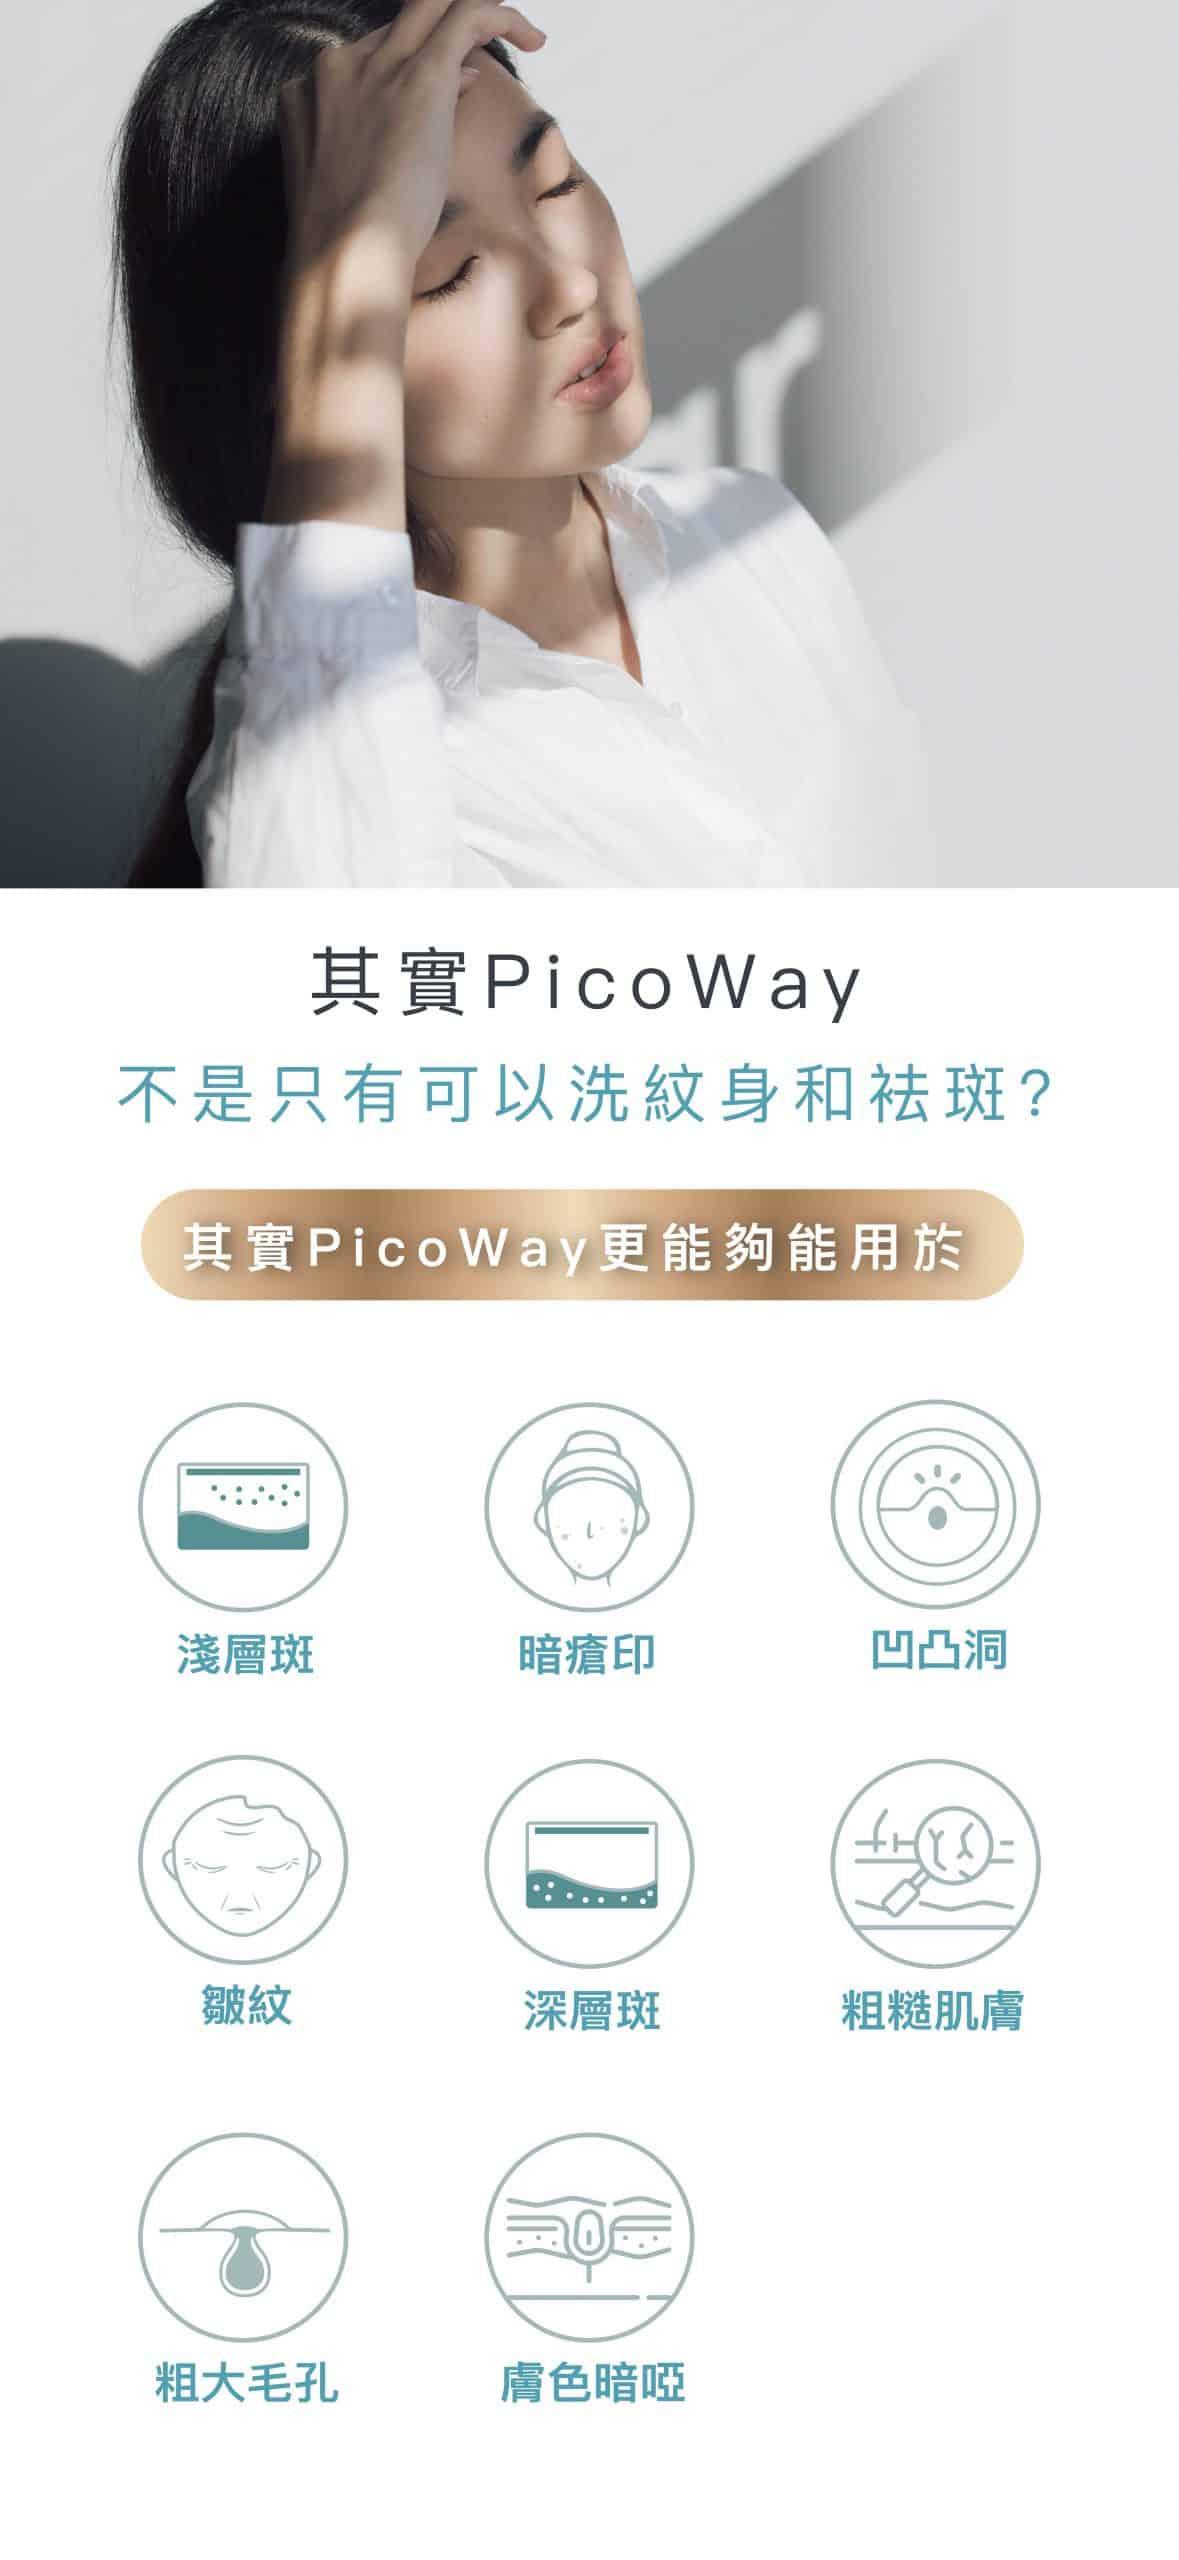 Picoway Picoway ptop3 44 3 scaled